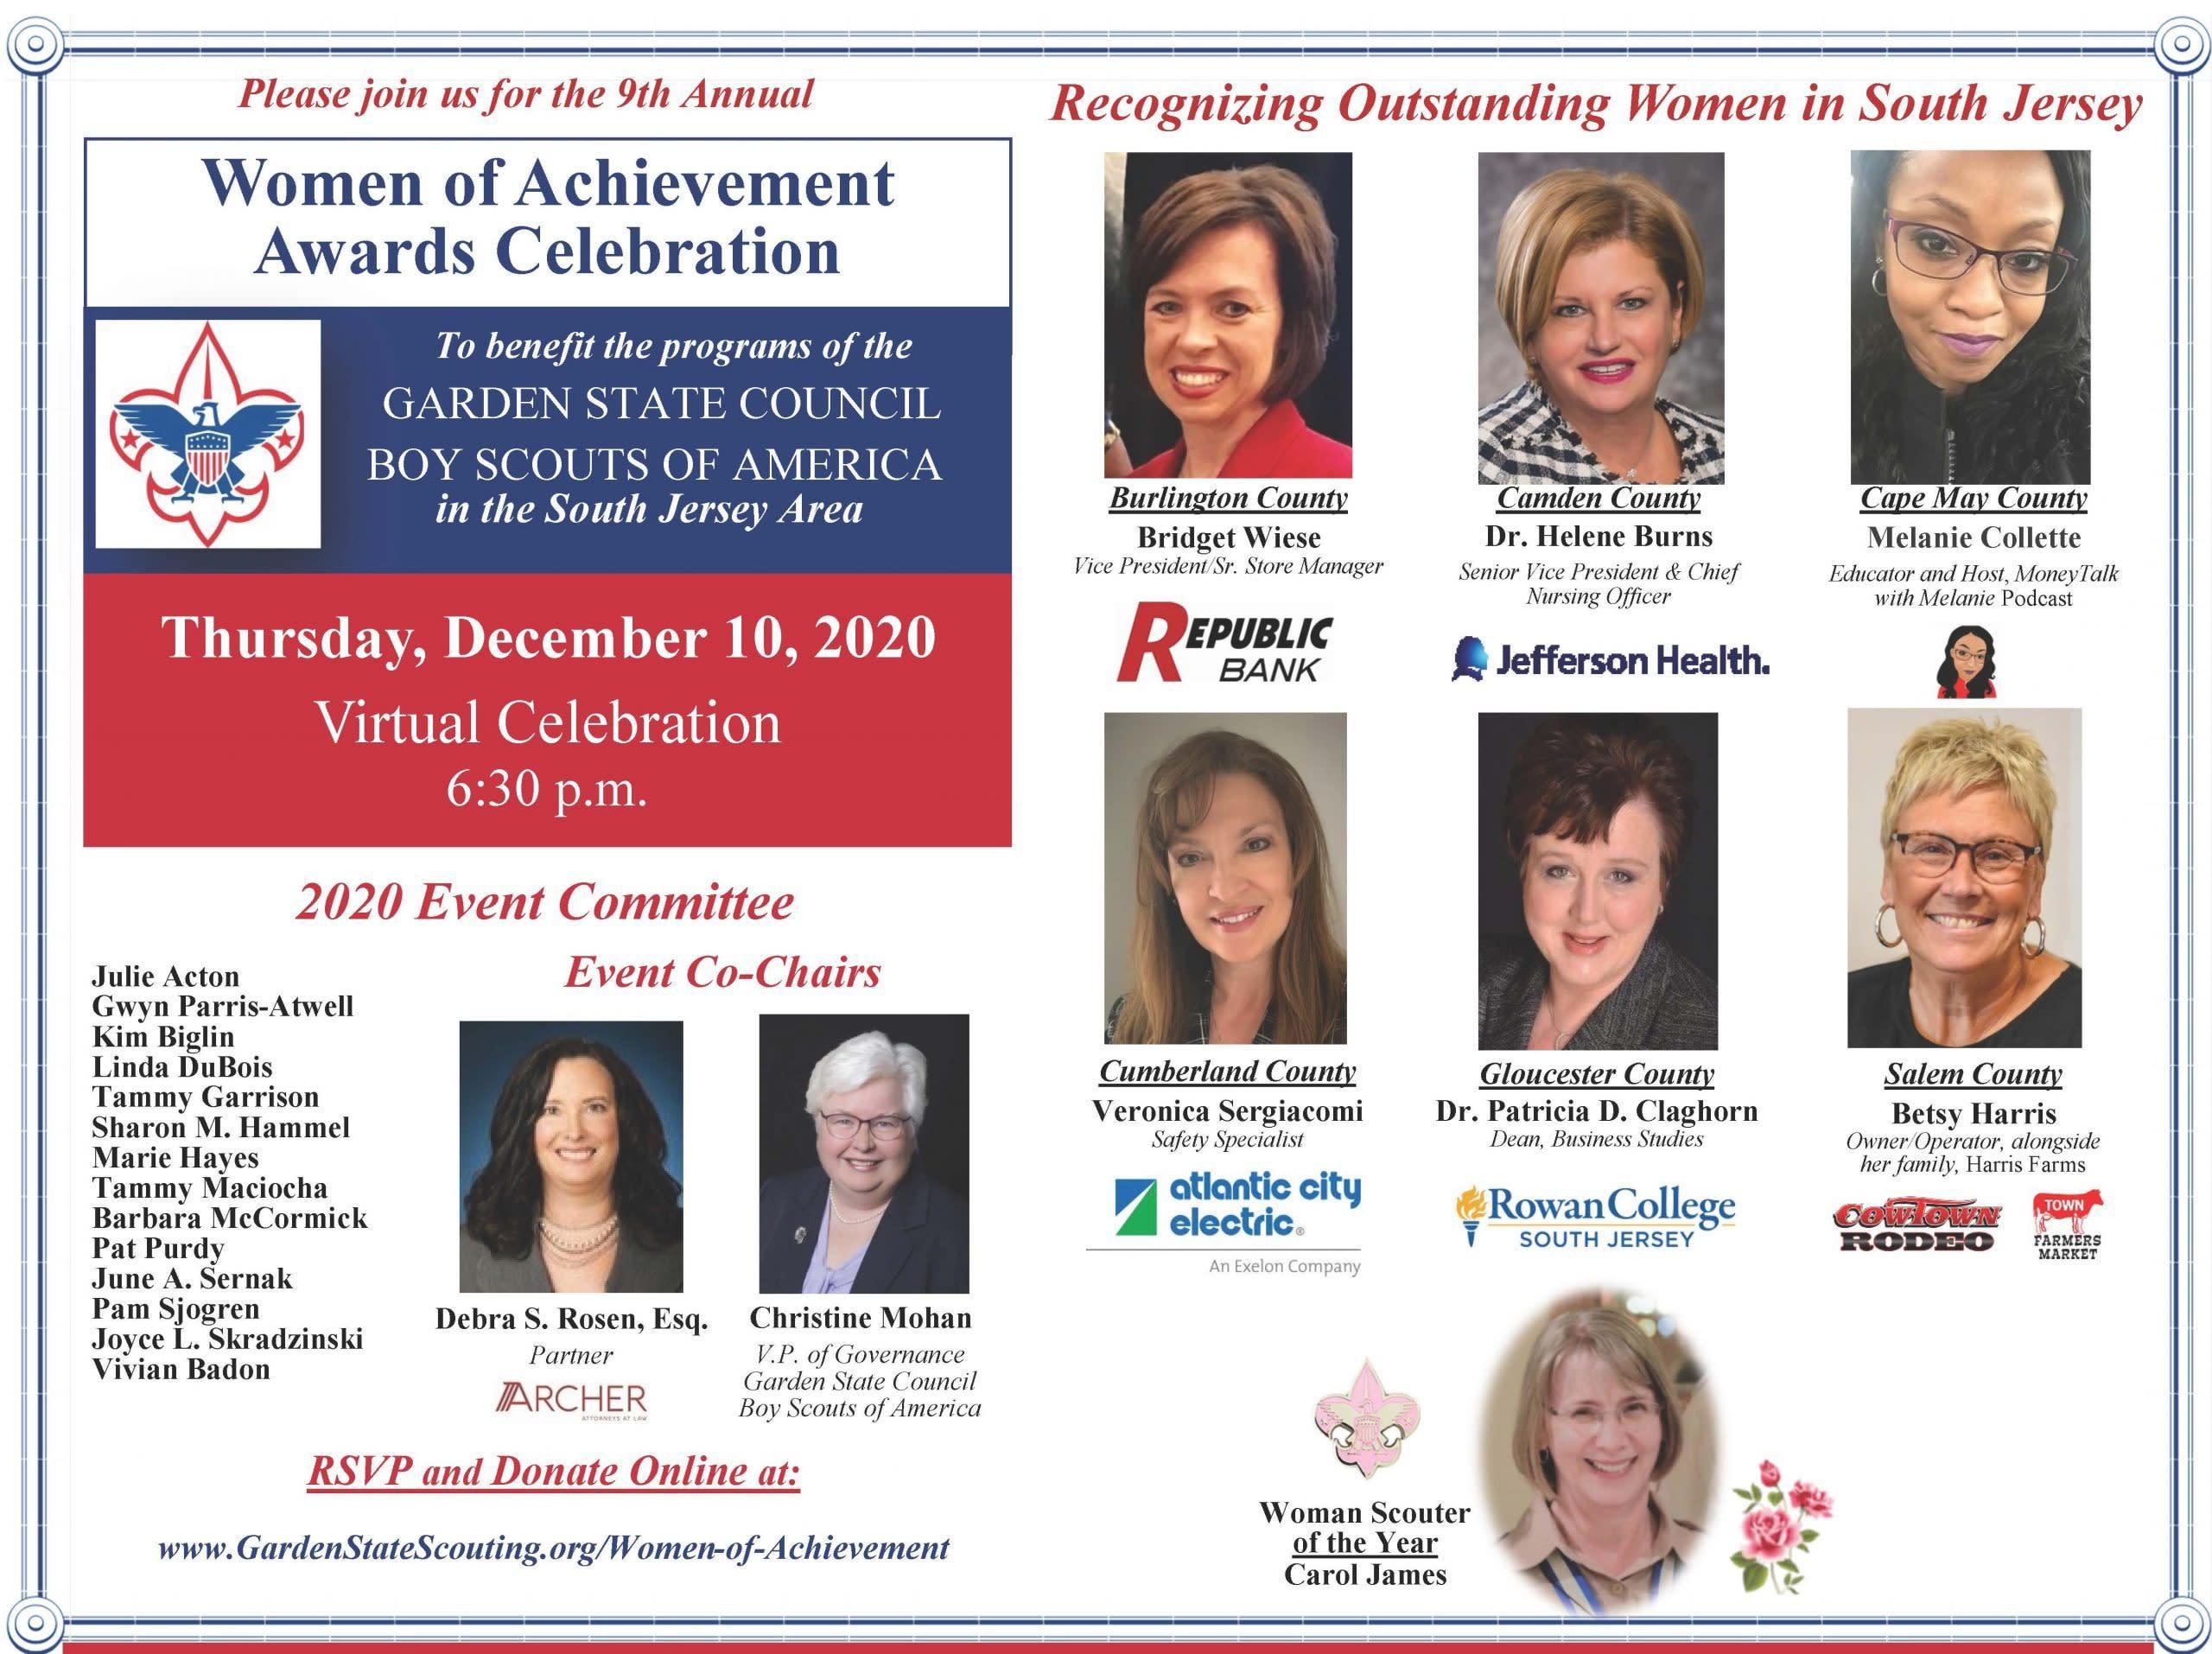 Garden State Council Women of Achievement celebration for December 10, 2020